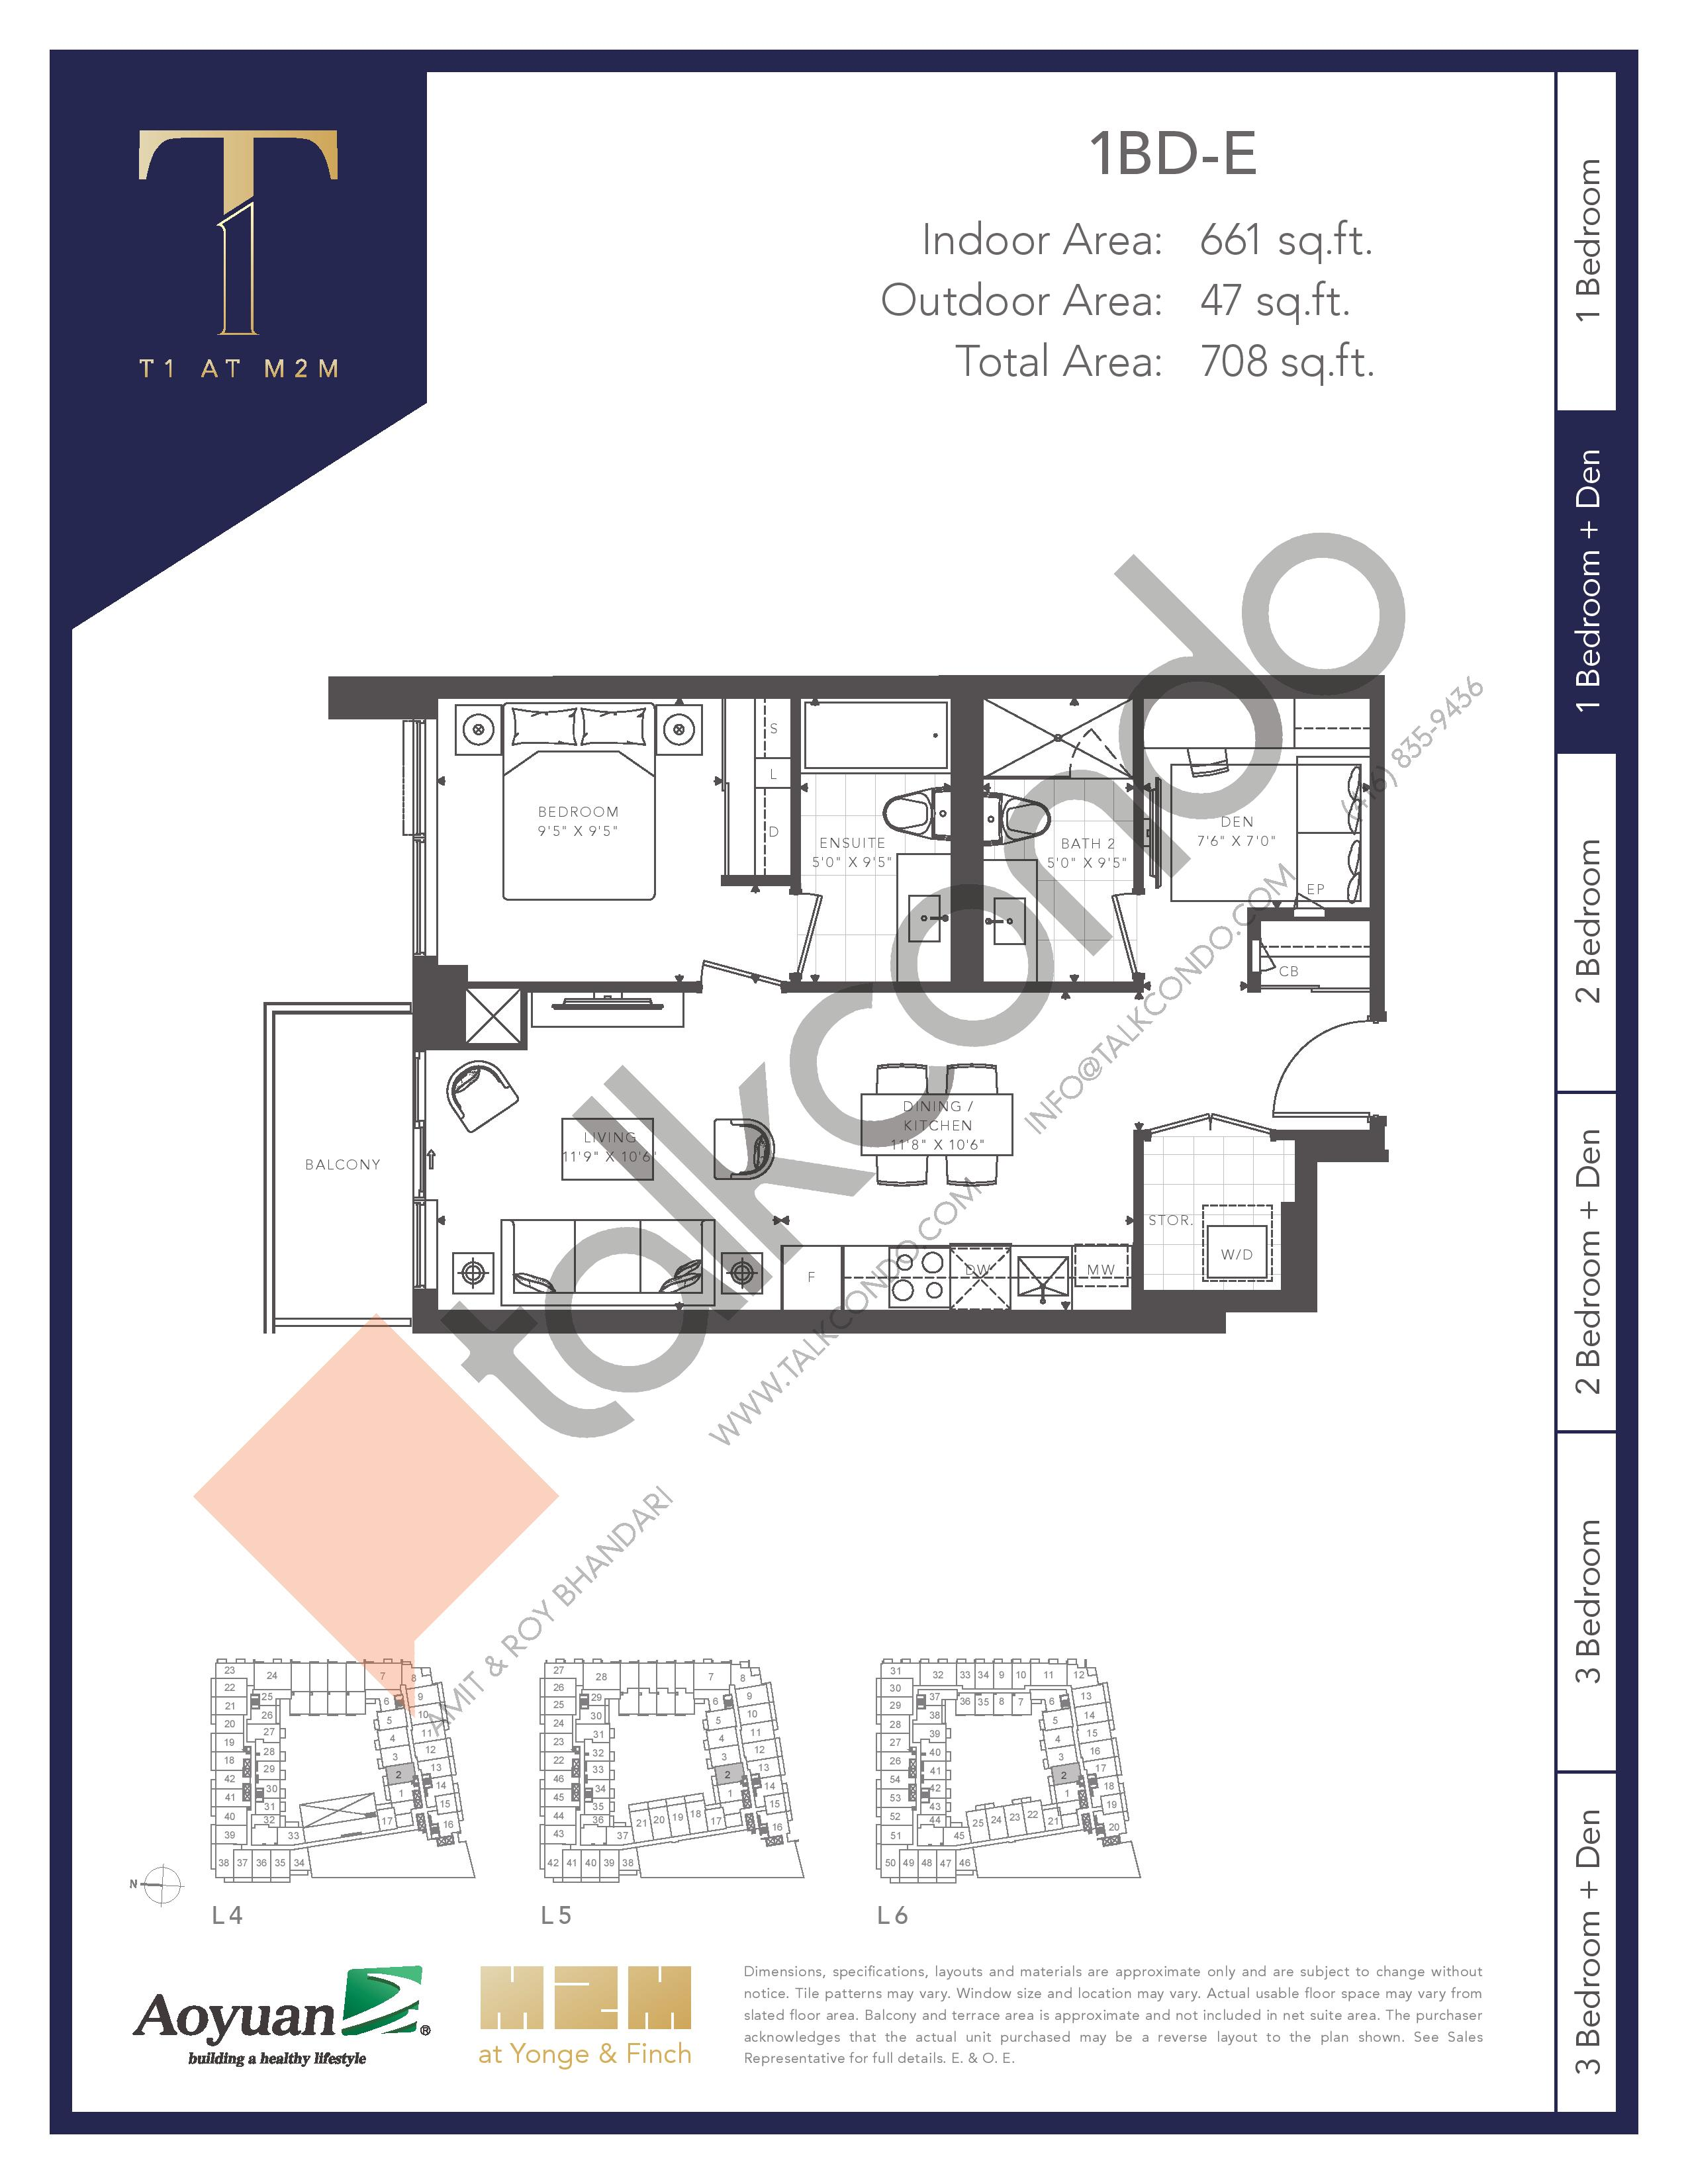 1BD-E (Tower) Floor Plan at T1 at M2M Condos - 661 sq.ft